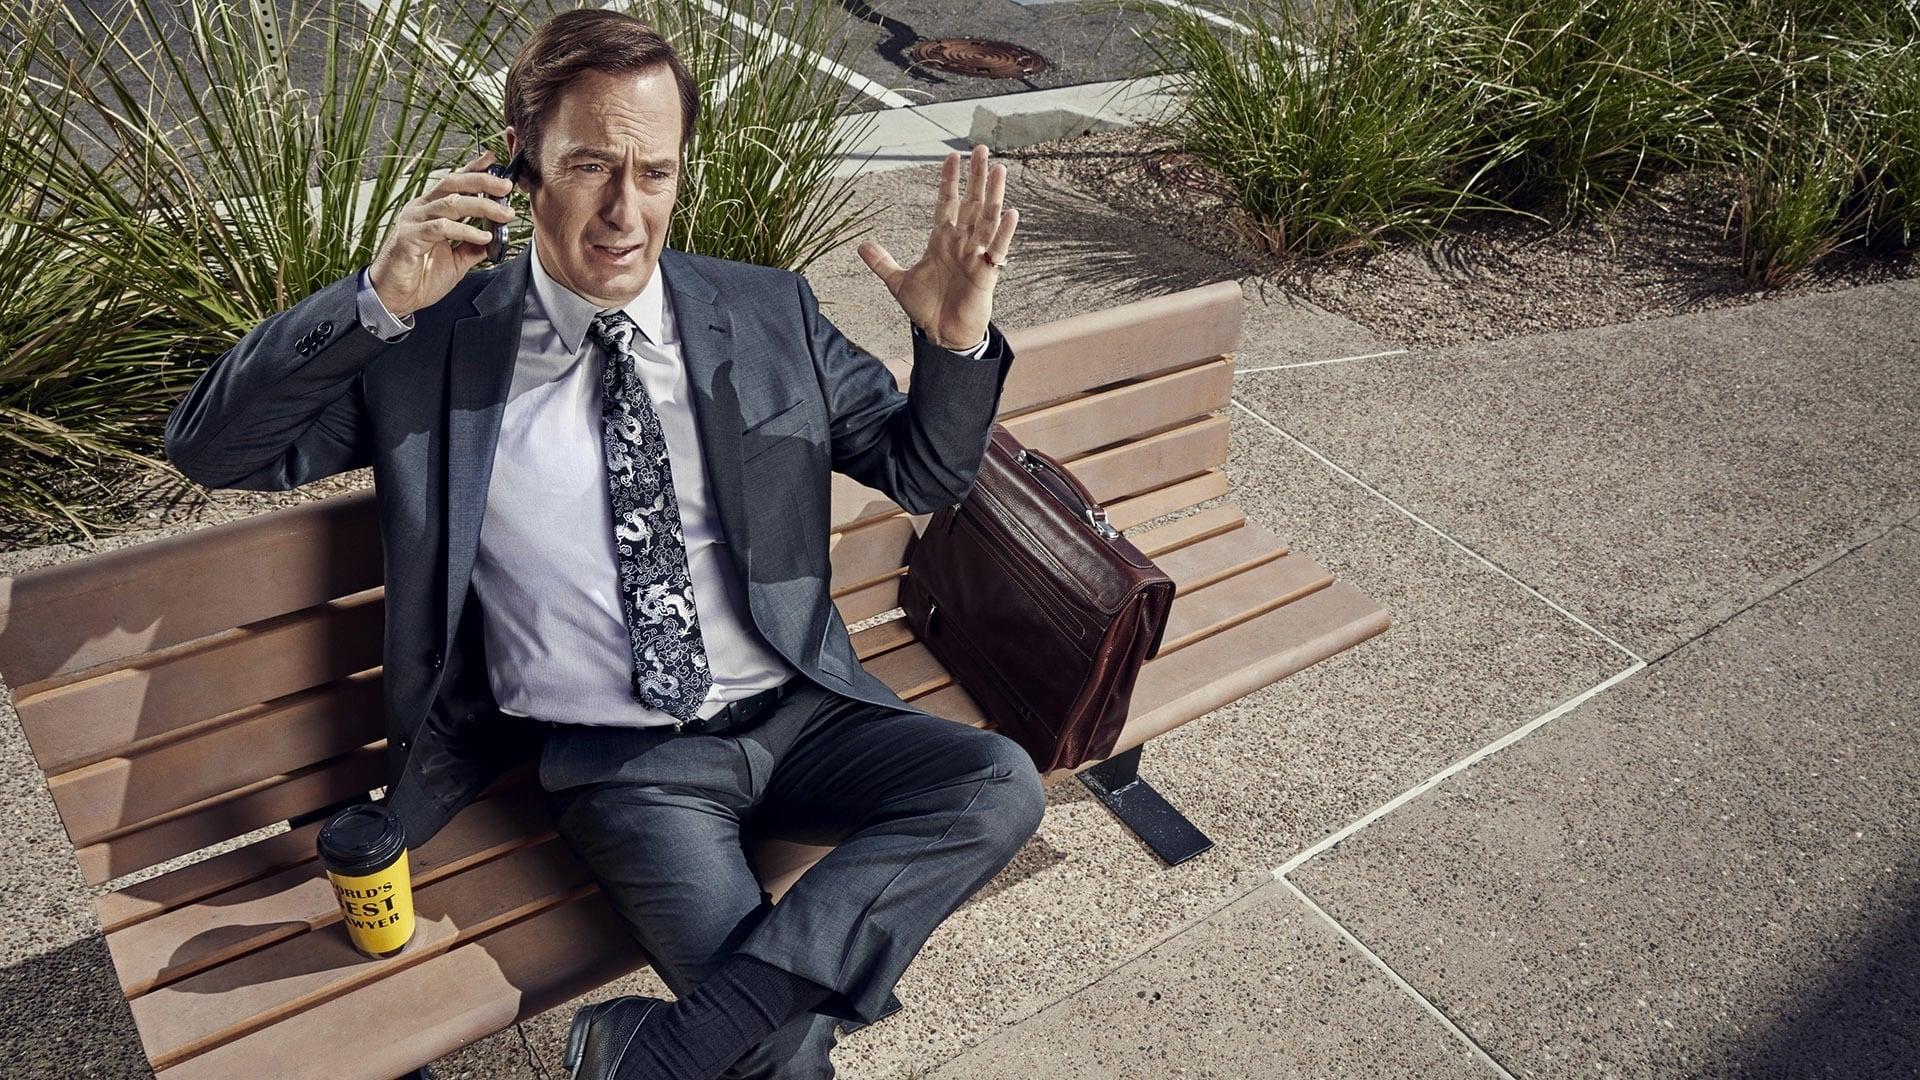 Better Call Saul - Season 5 Episode 5